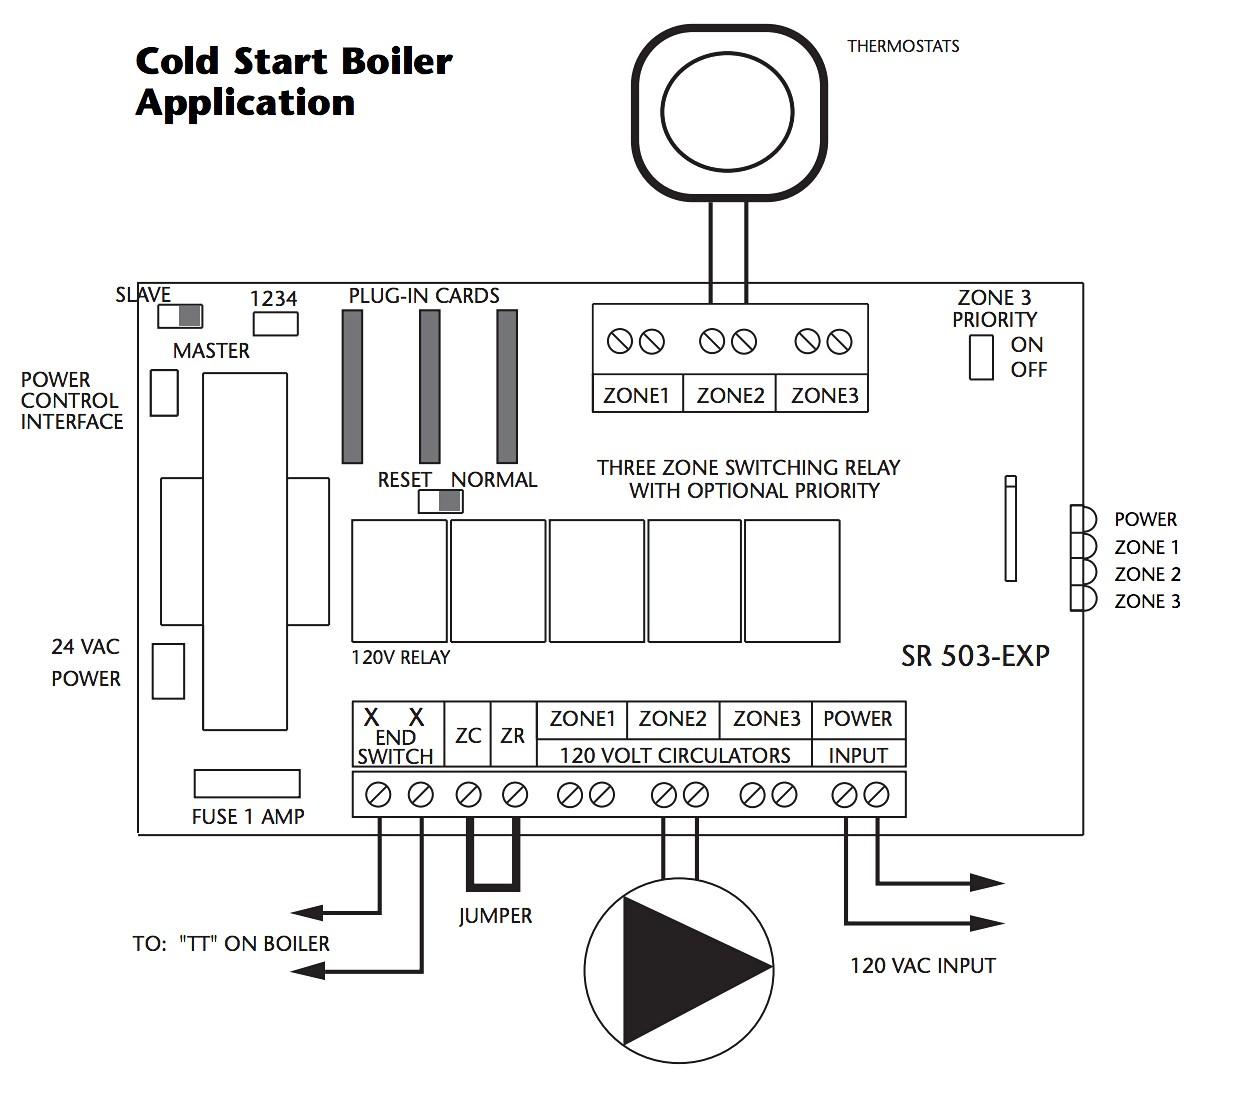 Diagram Taco 007 Zf5 9 Wiring Diagram Full Version Hd Quality Wiring Diagram Planetdiagram Festasanroccotorrepaduli It